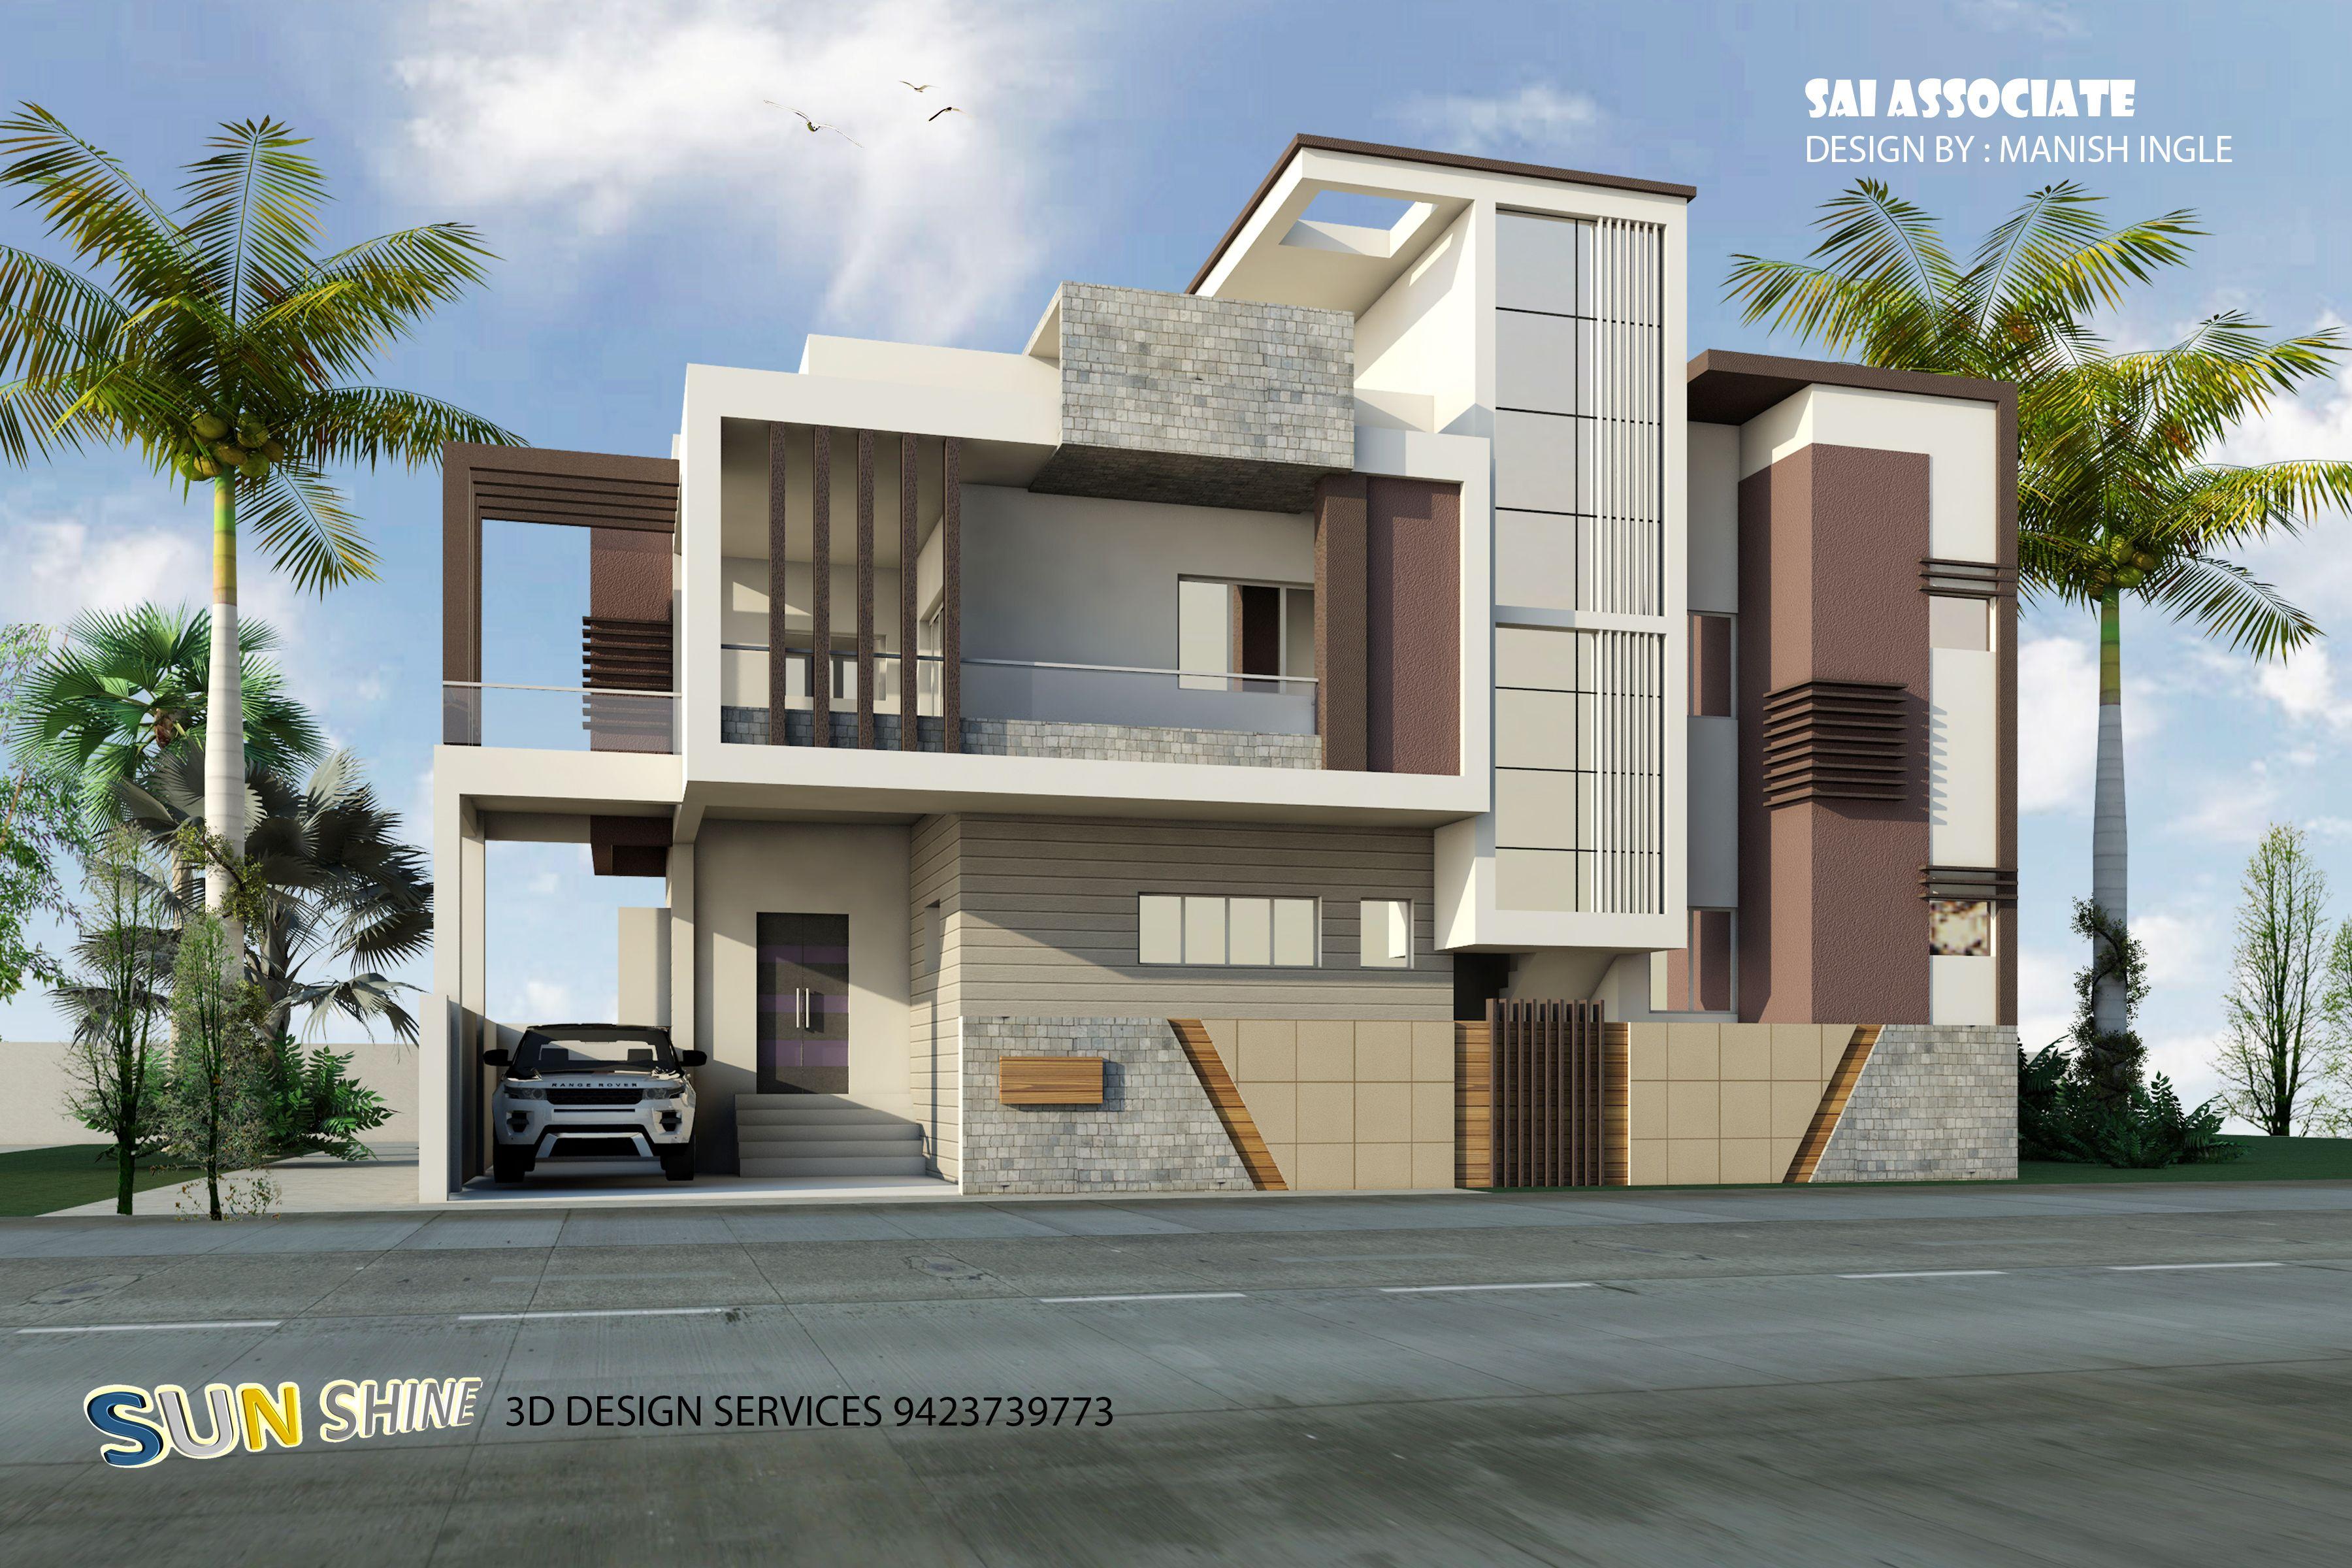 Beautiful home design designs homes bungalow house plans villa also in pinterest rh